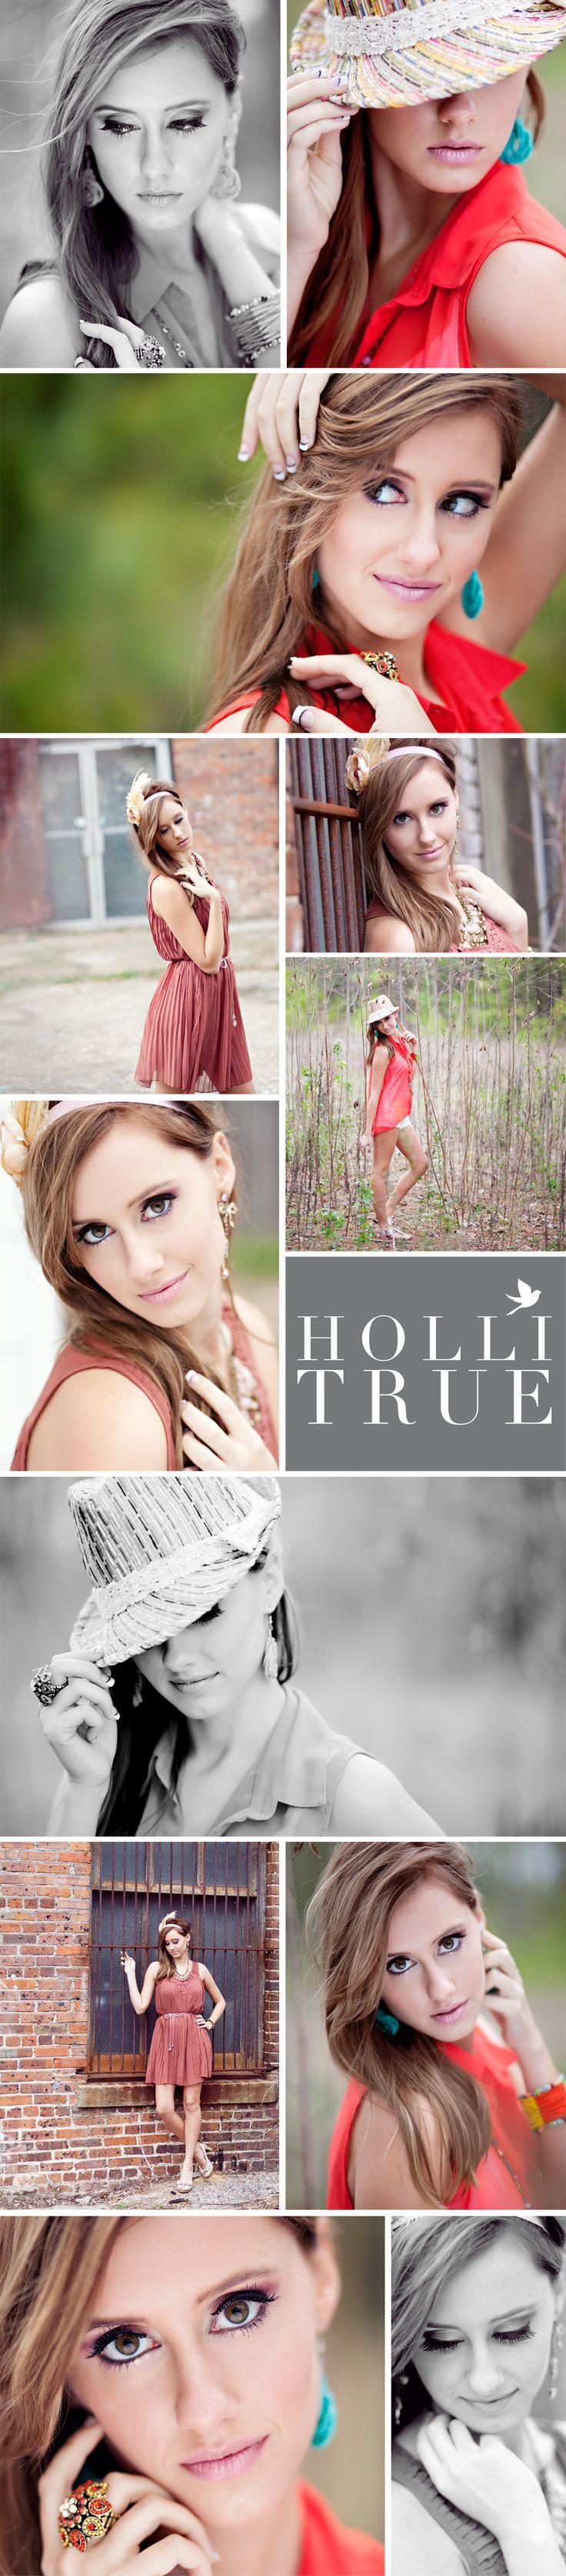 Holli True | www.hollitrue.com | Photography posing workshop